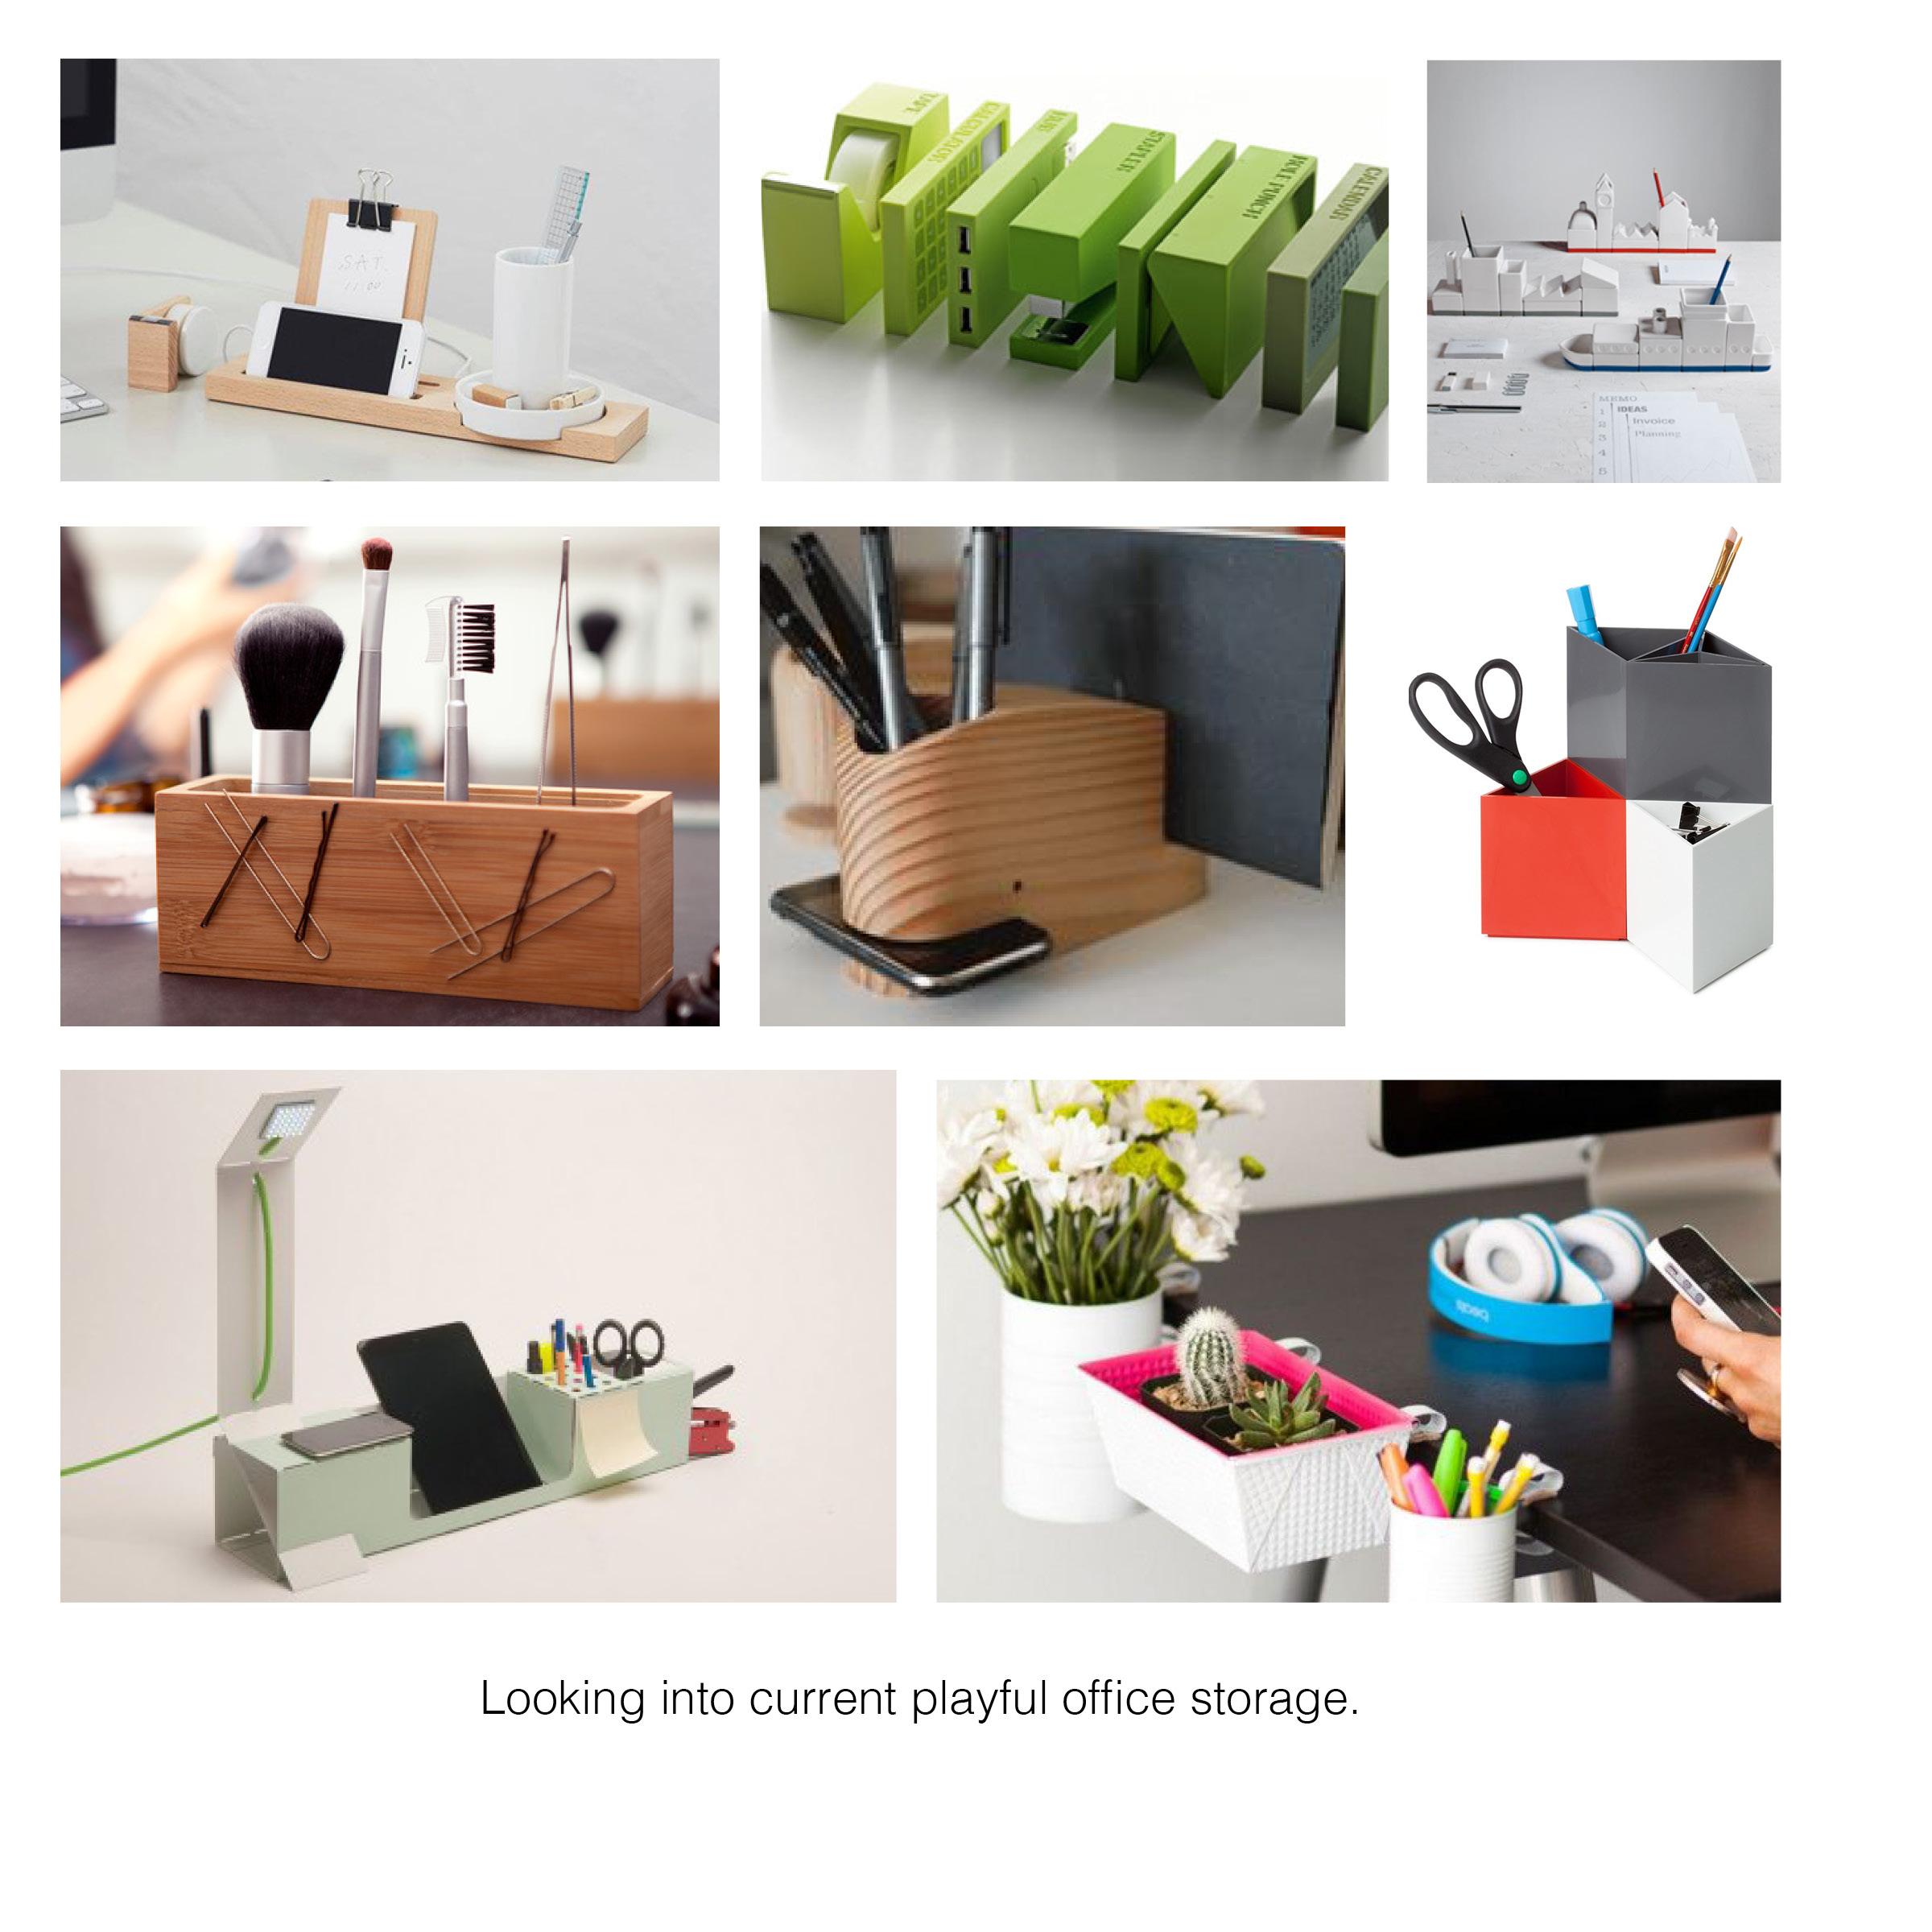 Playful office storage